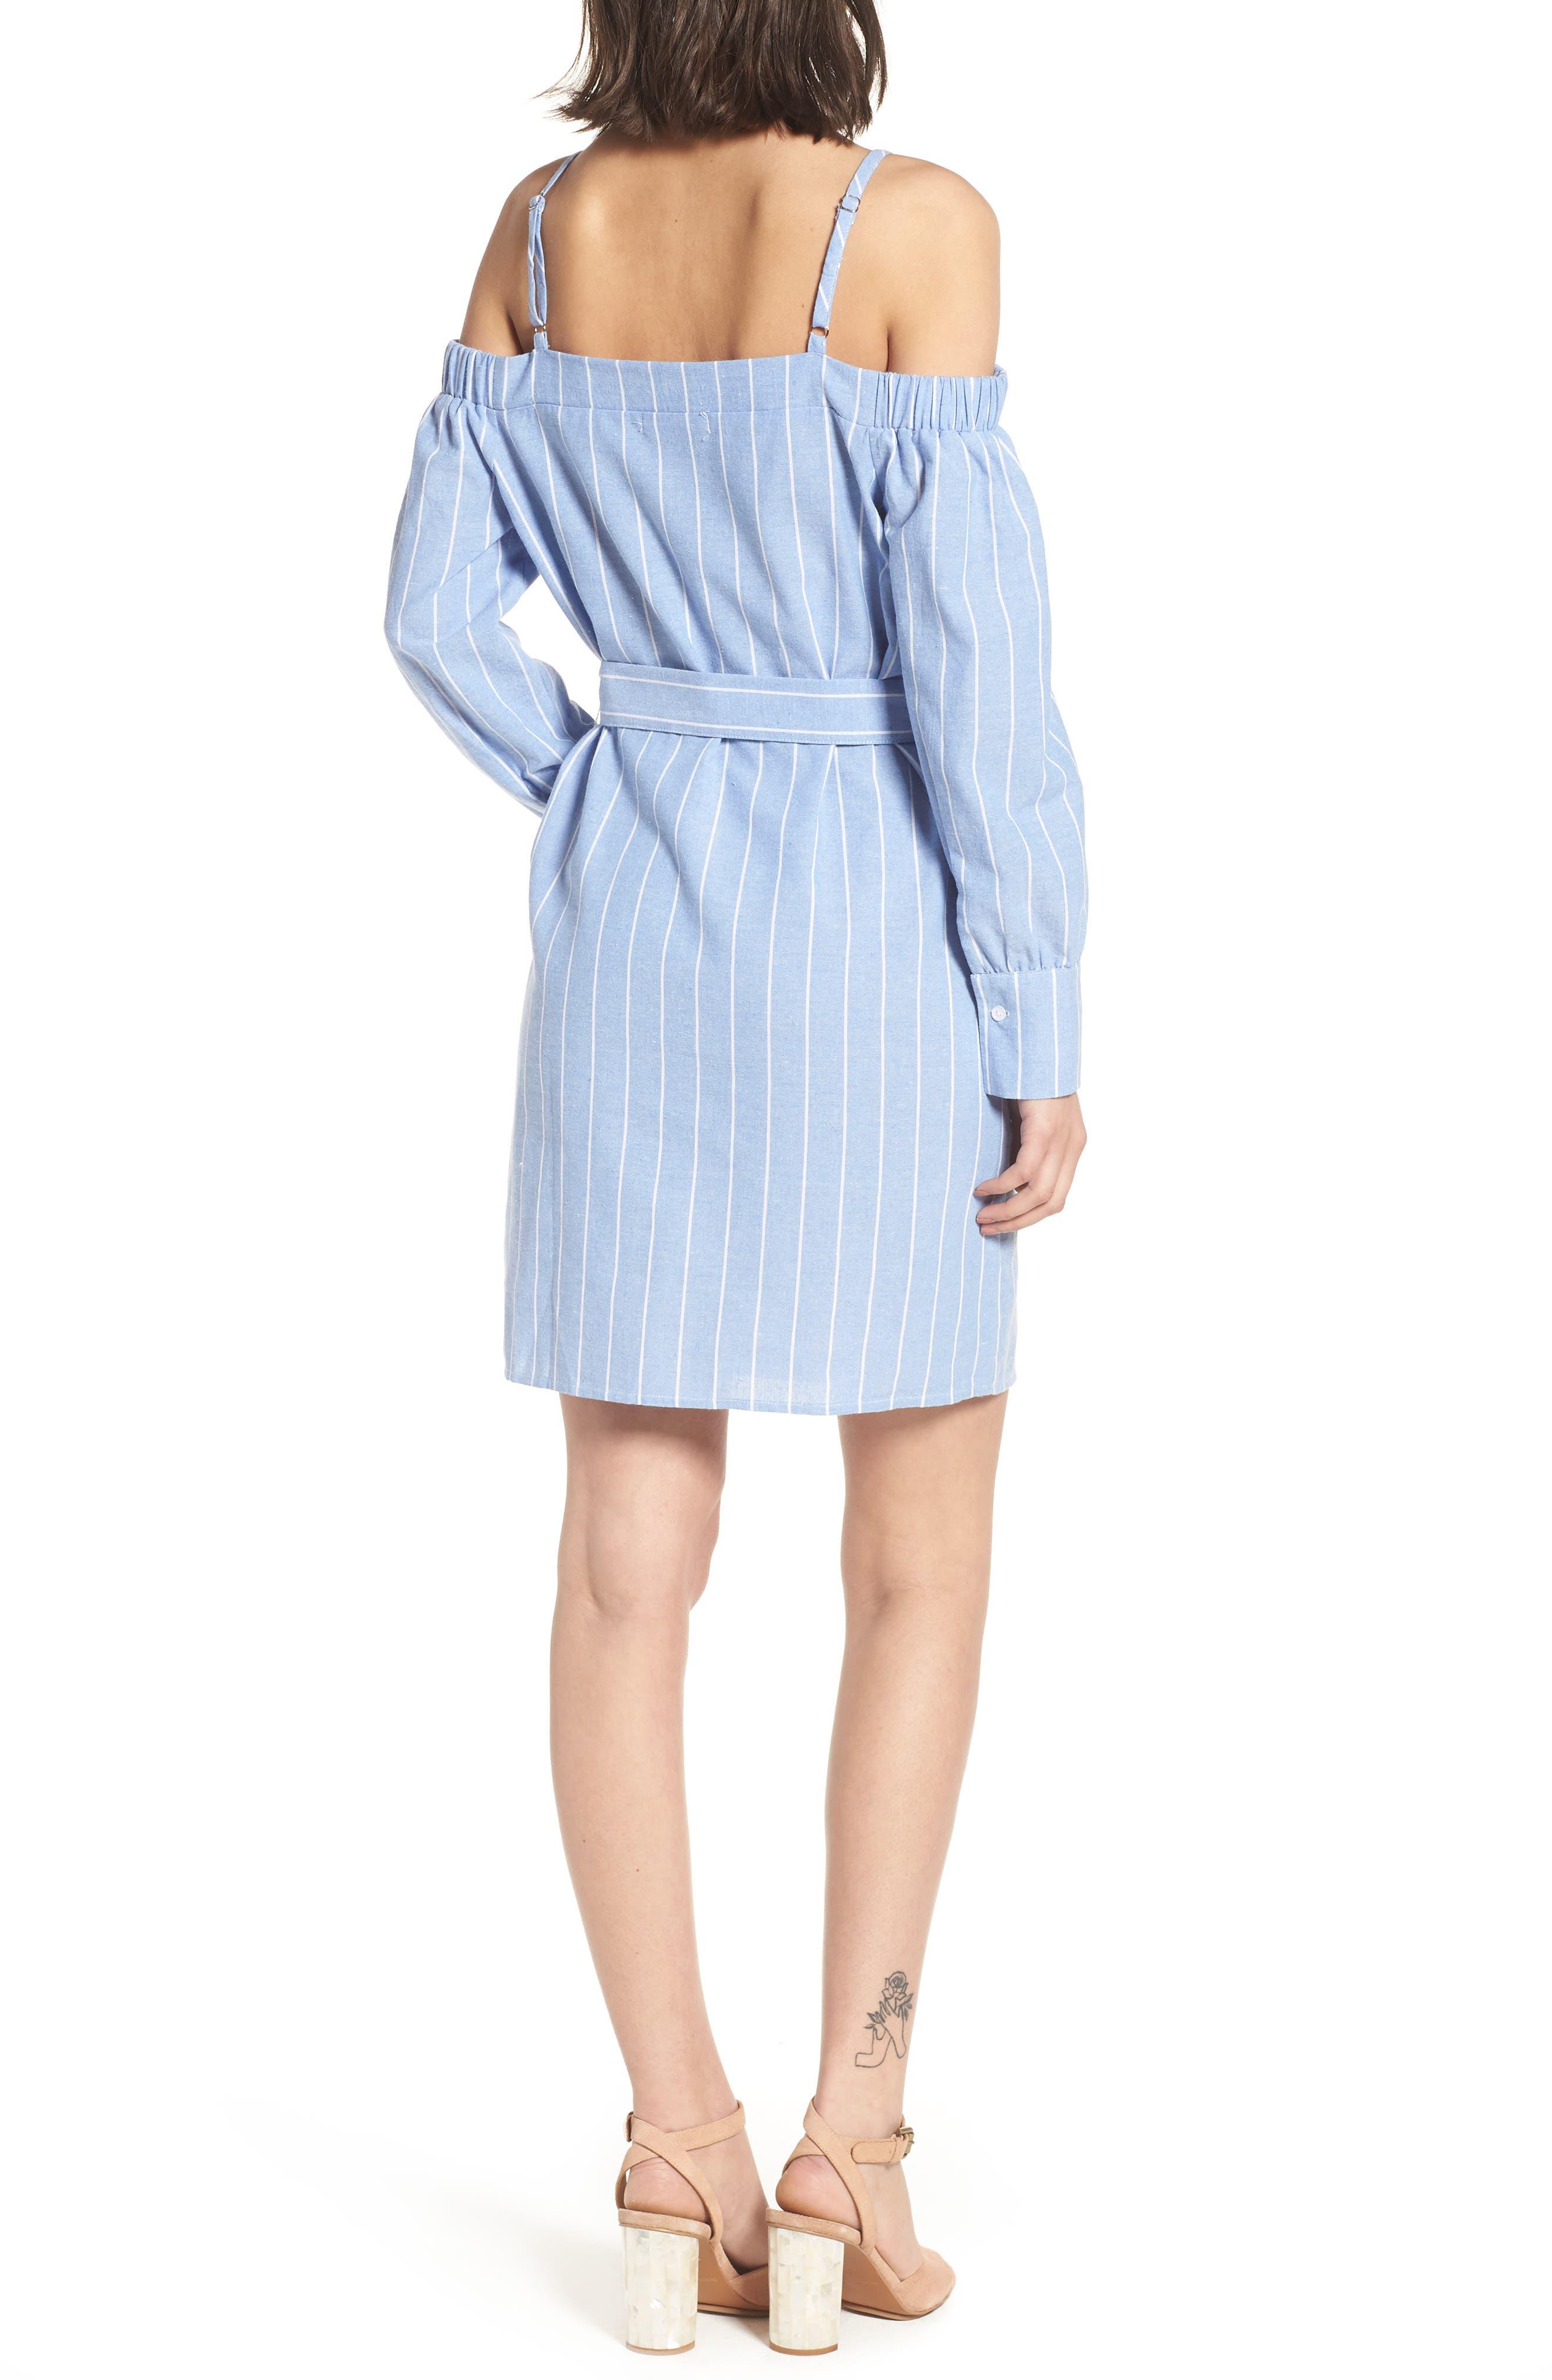 Bishop + Young Chrissy Cold Shoulder Dress,                             Alternate thumbnail 2, color,                             Blue White Stripe